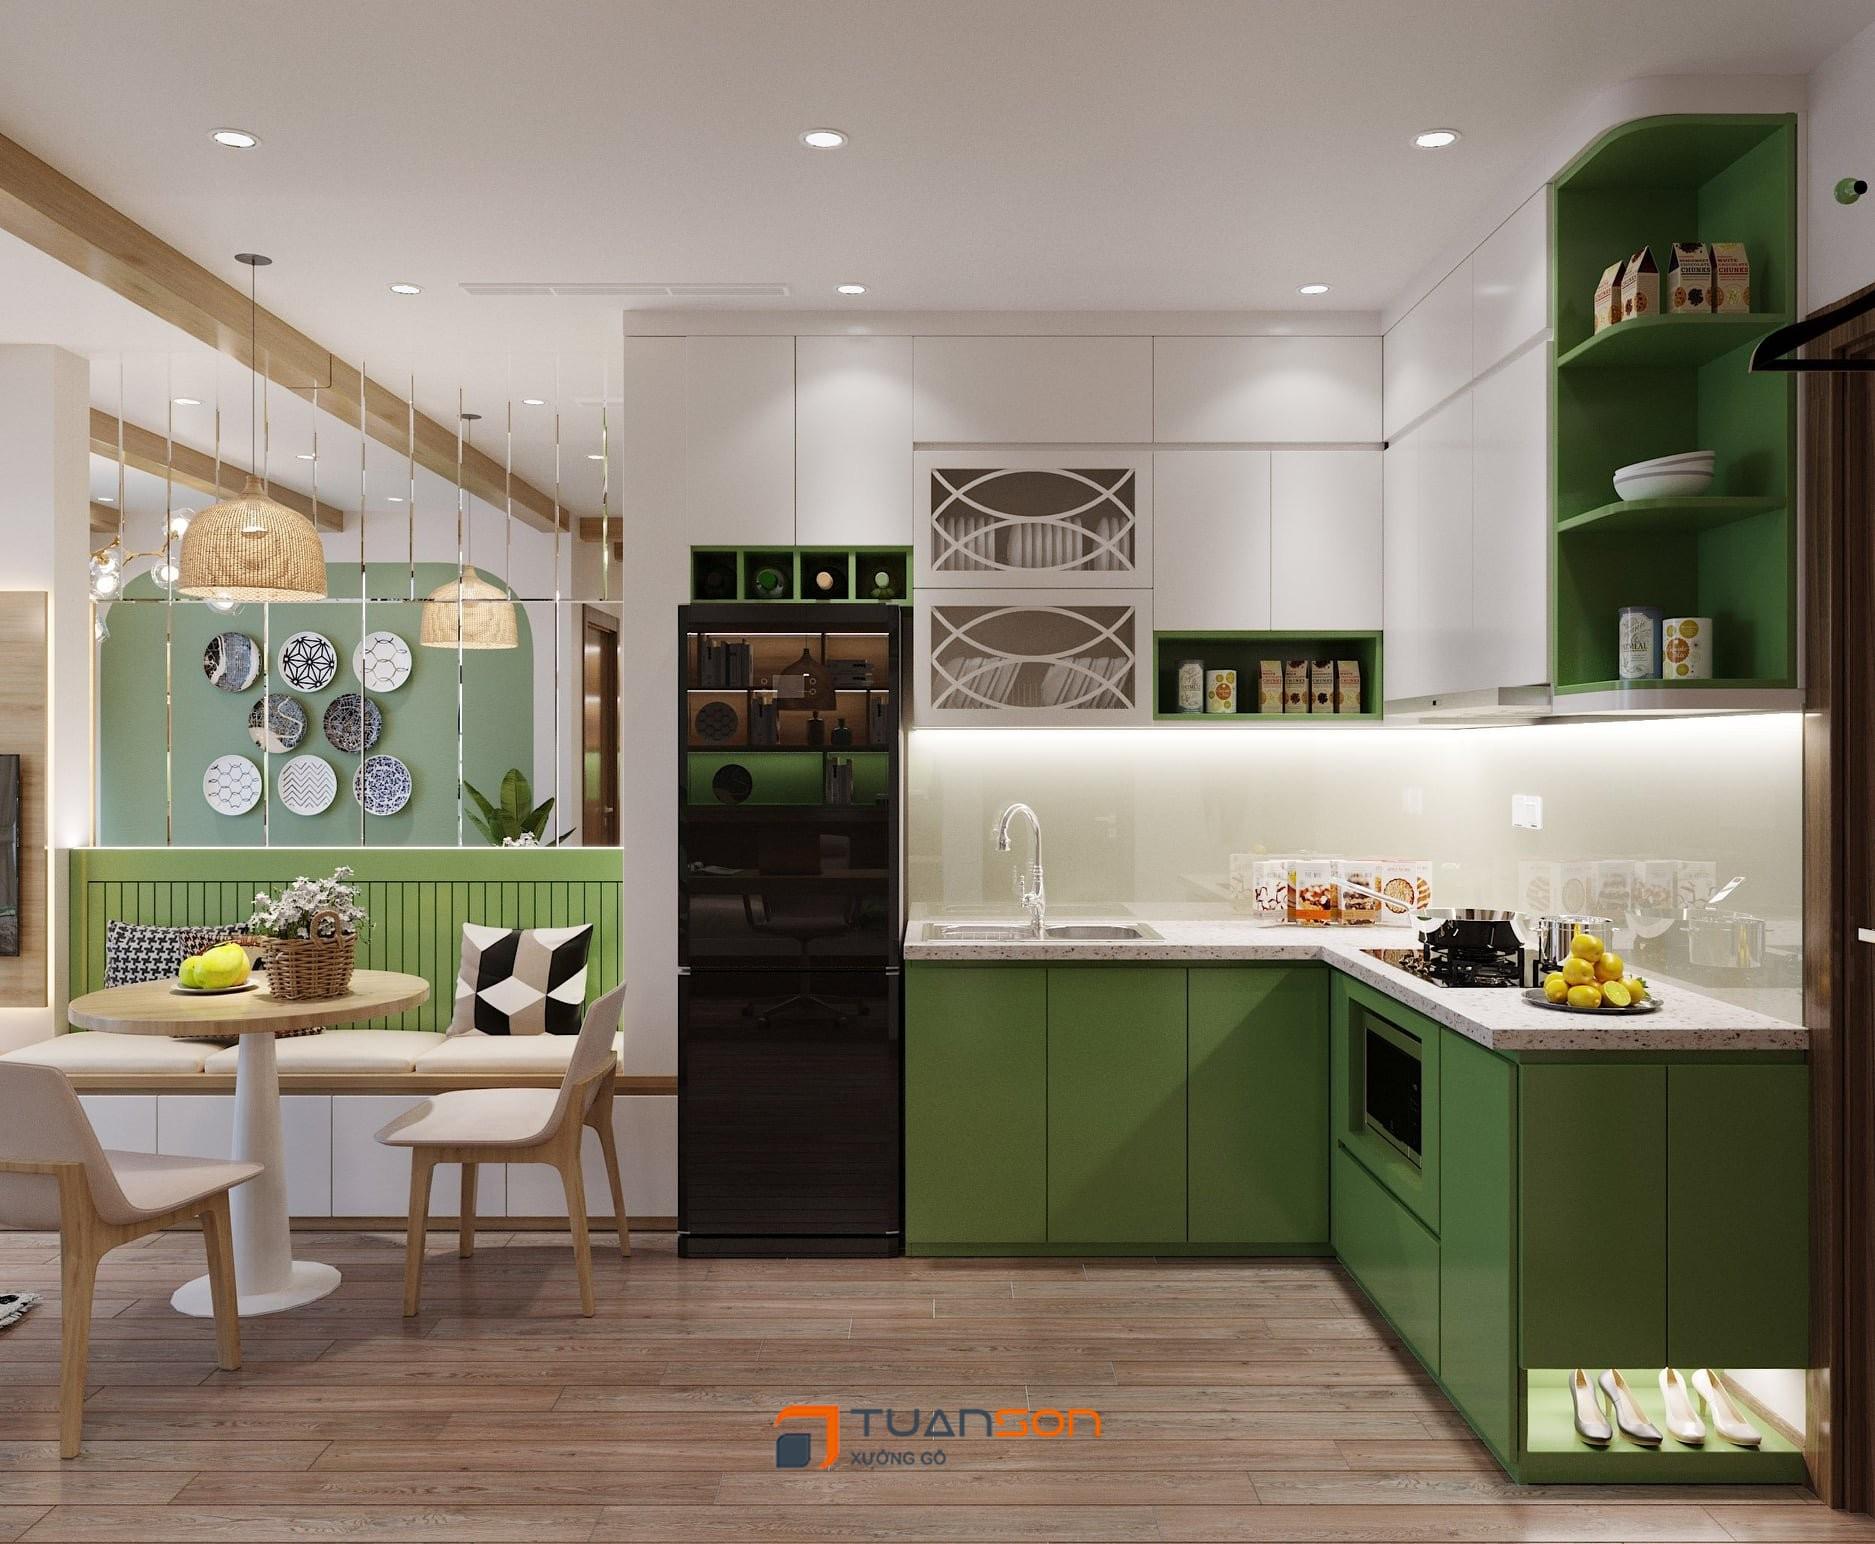 Mẫu thiết kế bếp căn hộ 1PN+1 (43m2) Vinhomes Ocean Park đẹp